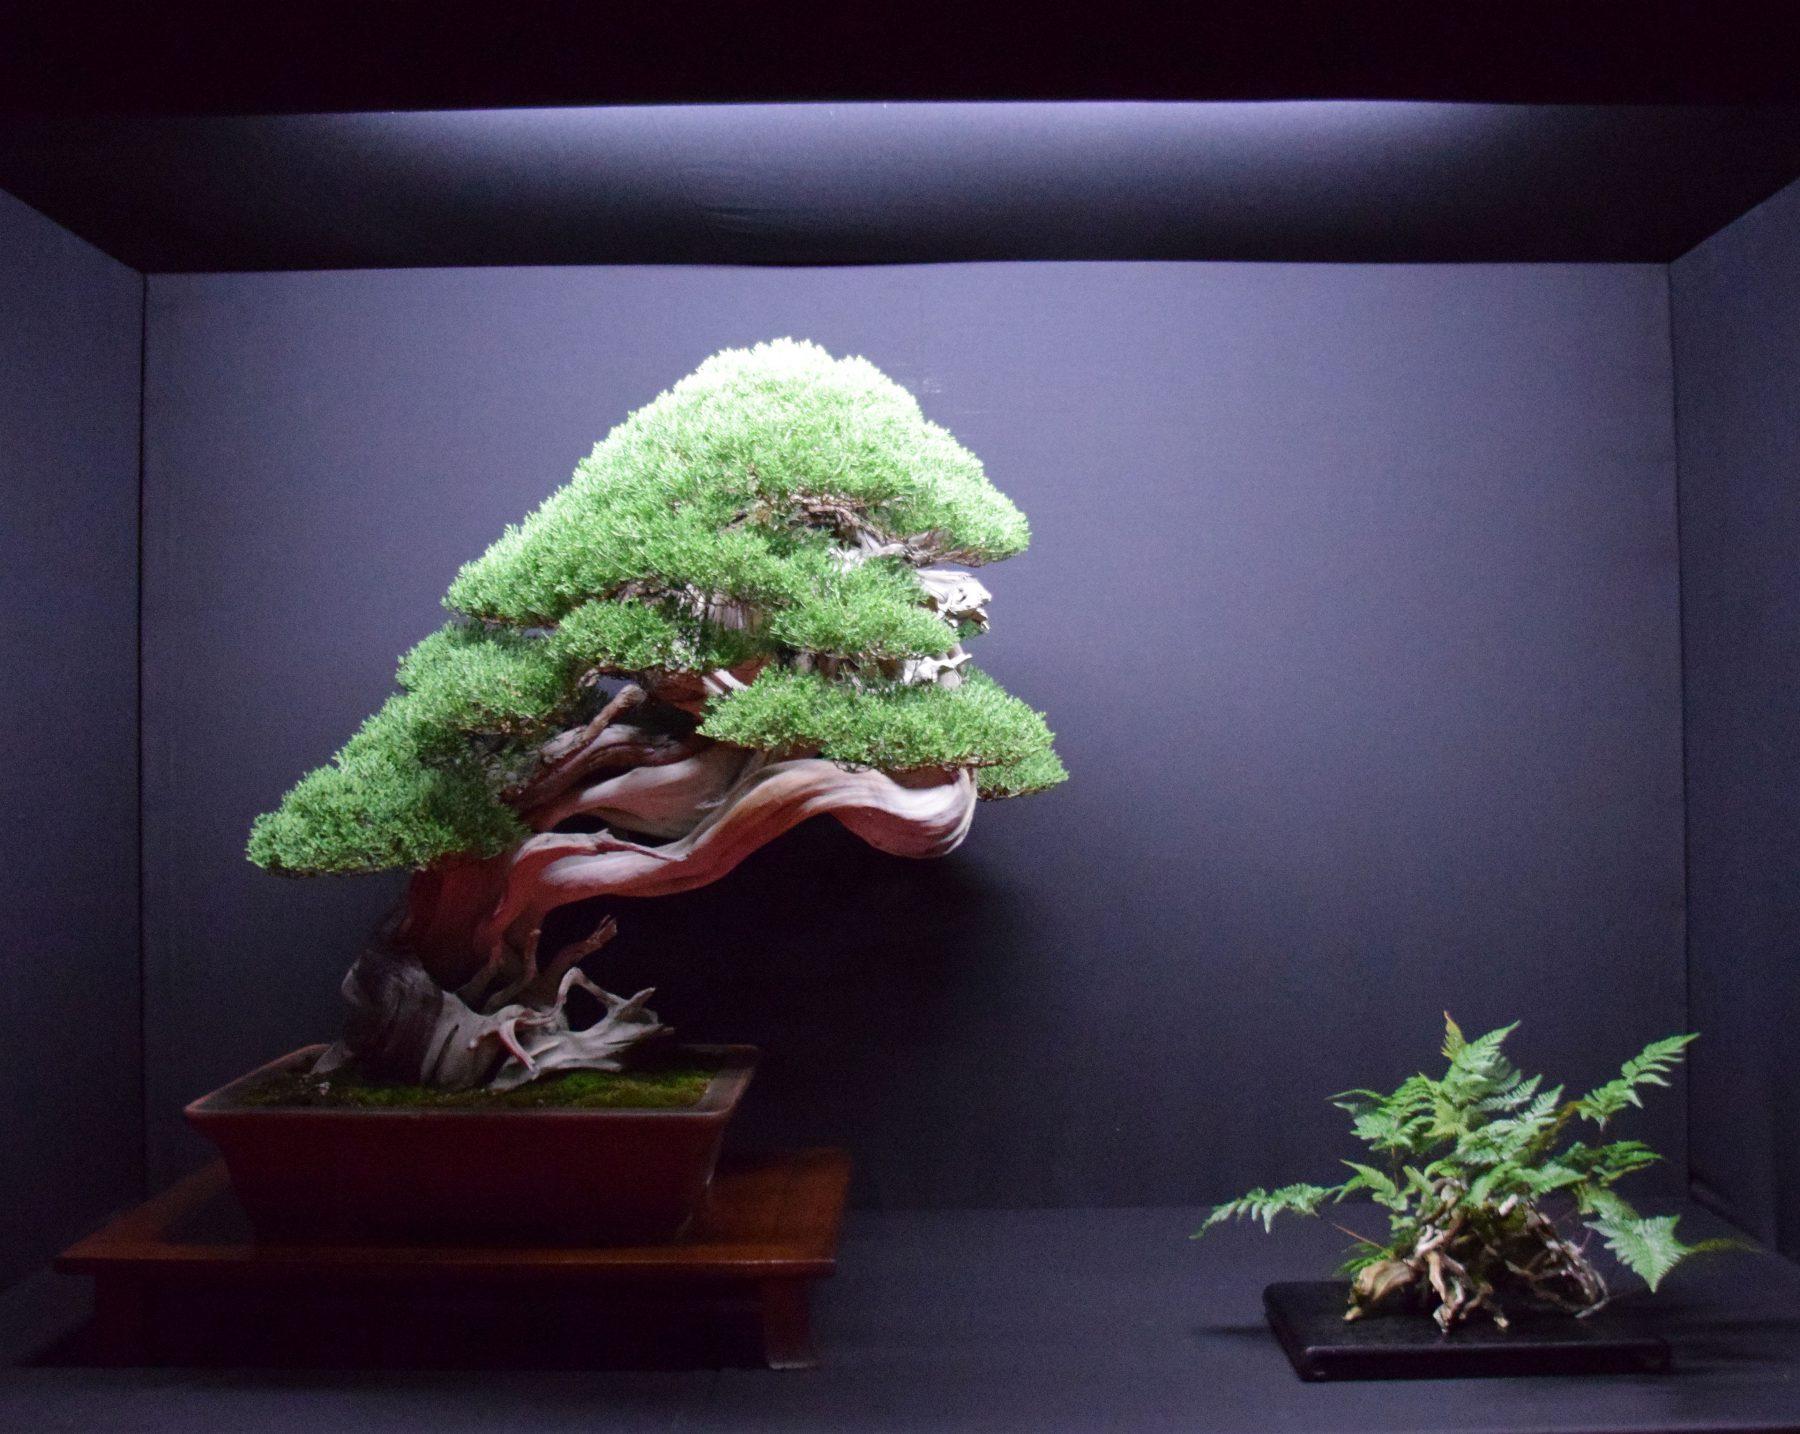 bonsai-museum-luis-vallejo-025